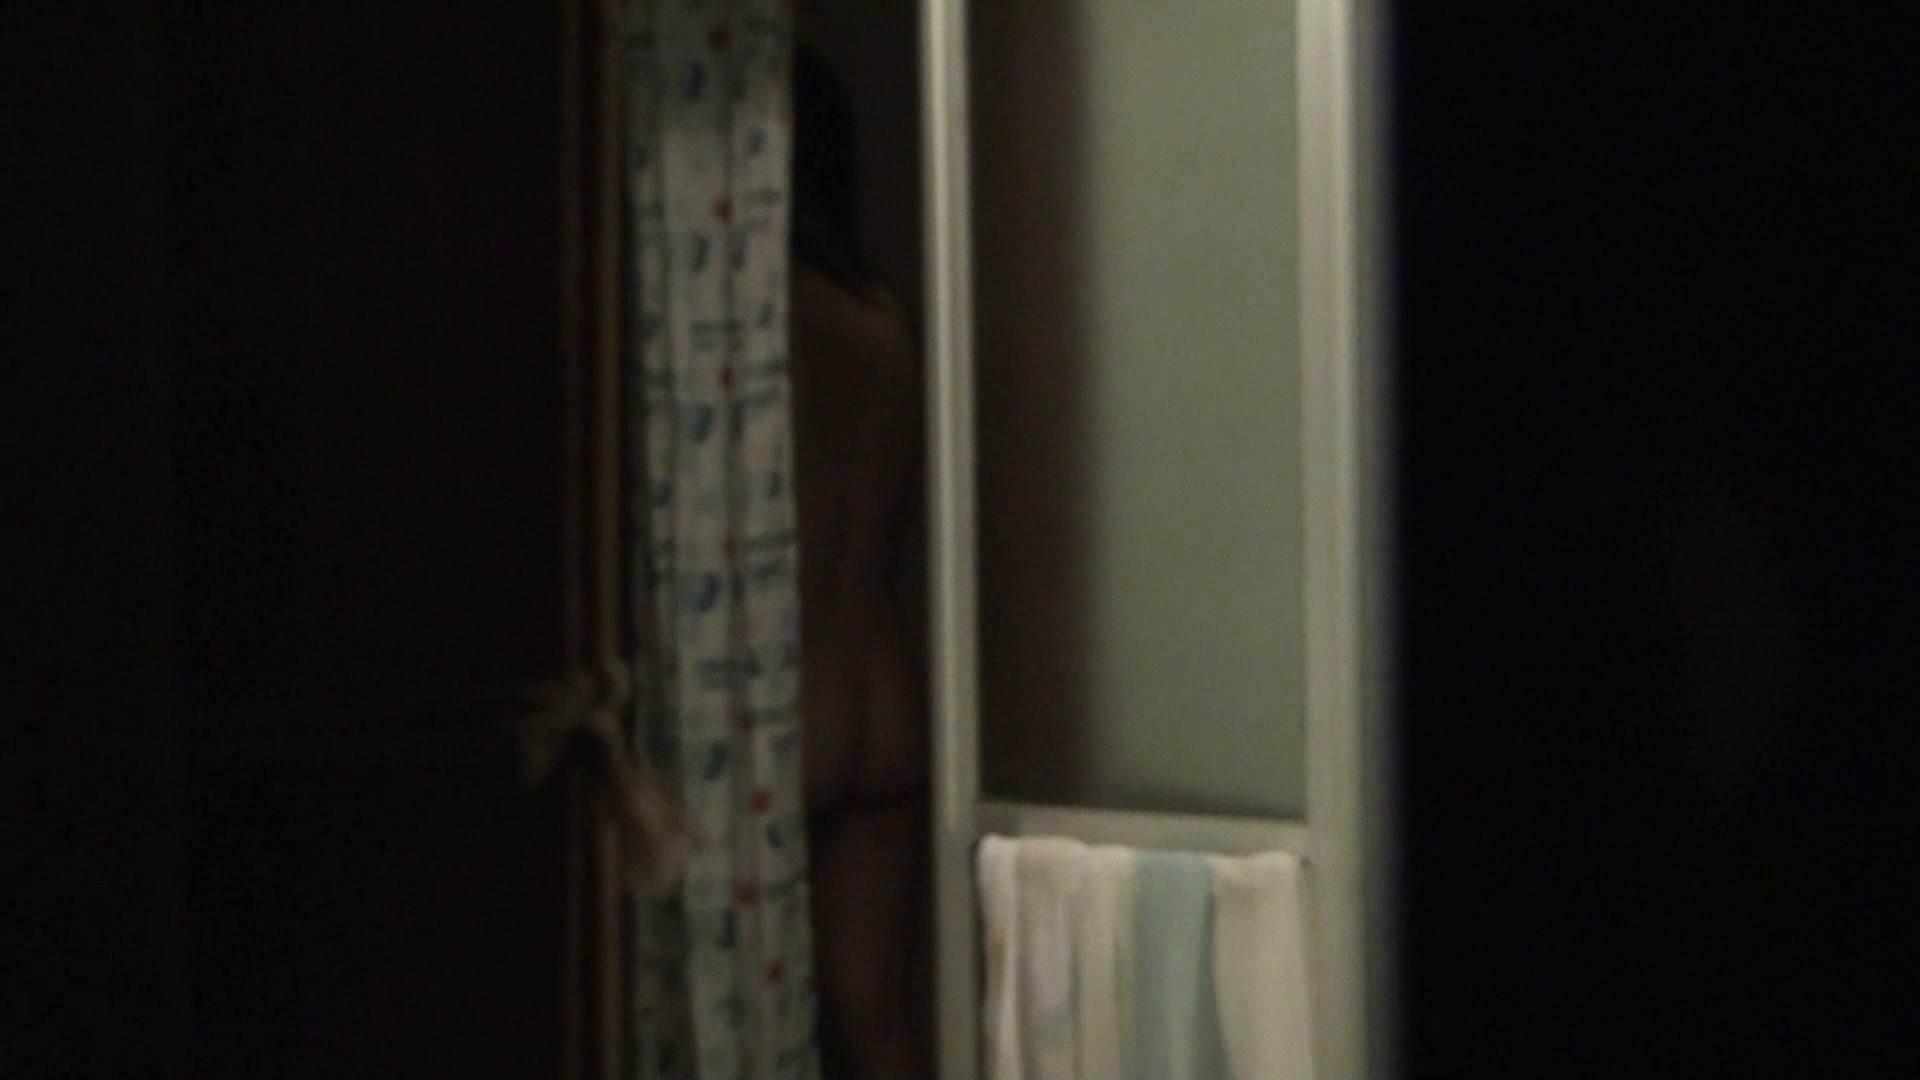 vol.06顔を洗い流す極上お女市さんの裸体をハイビジョンで!風呂上り着替え必見! 美乳 オマンコ動画キャプチャ 68画像 52